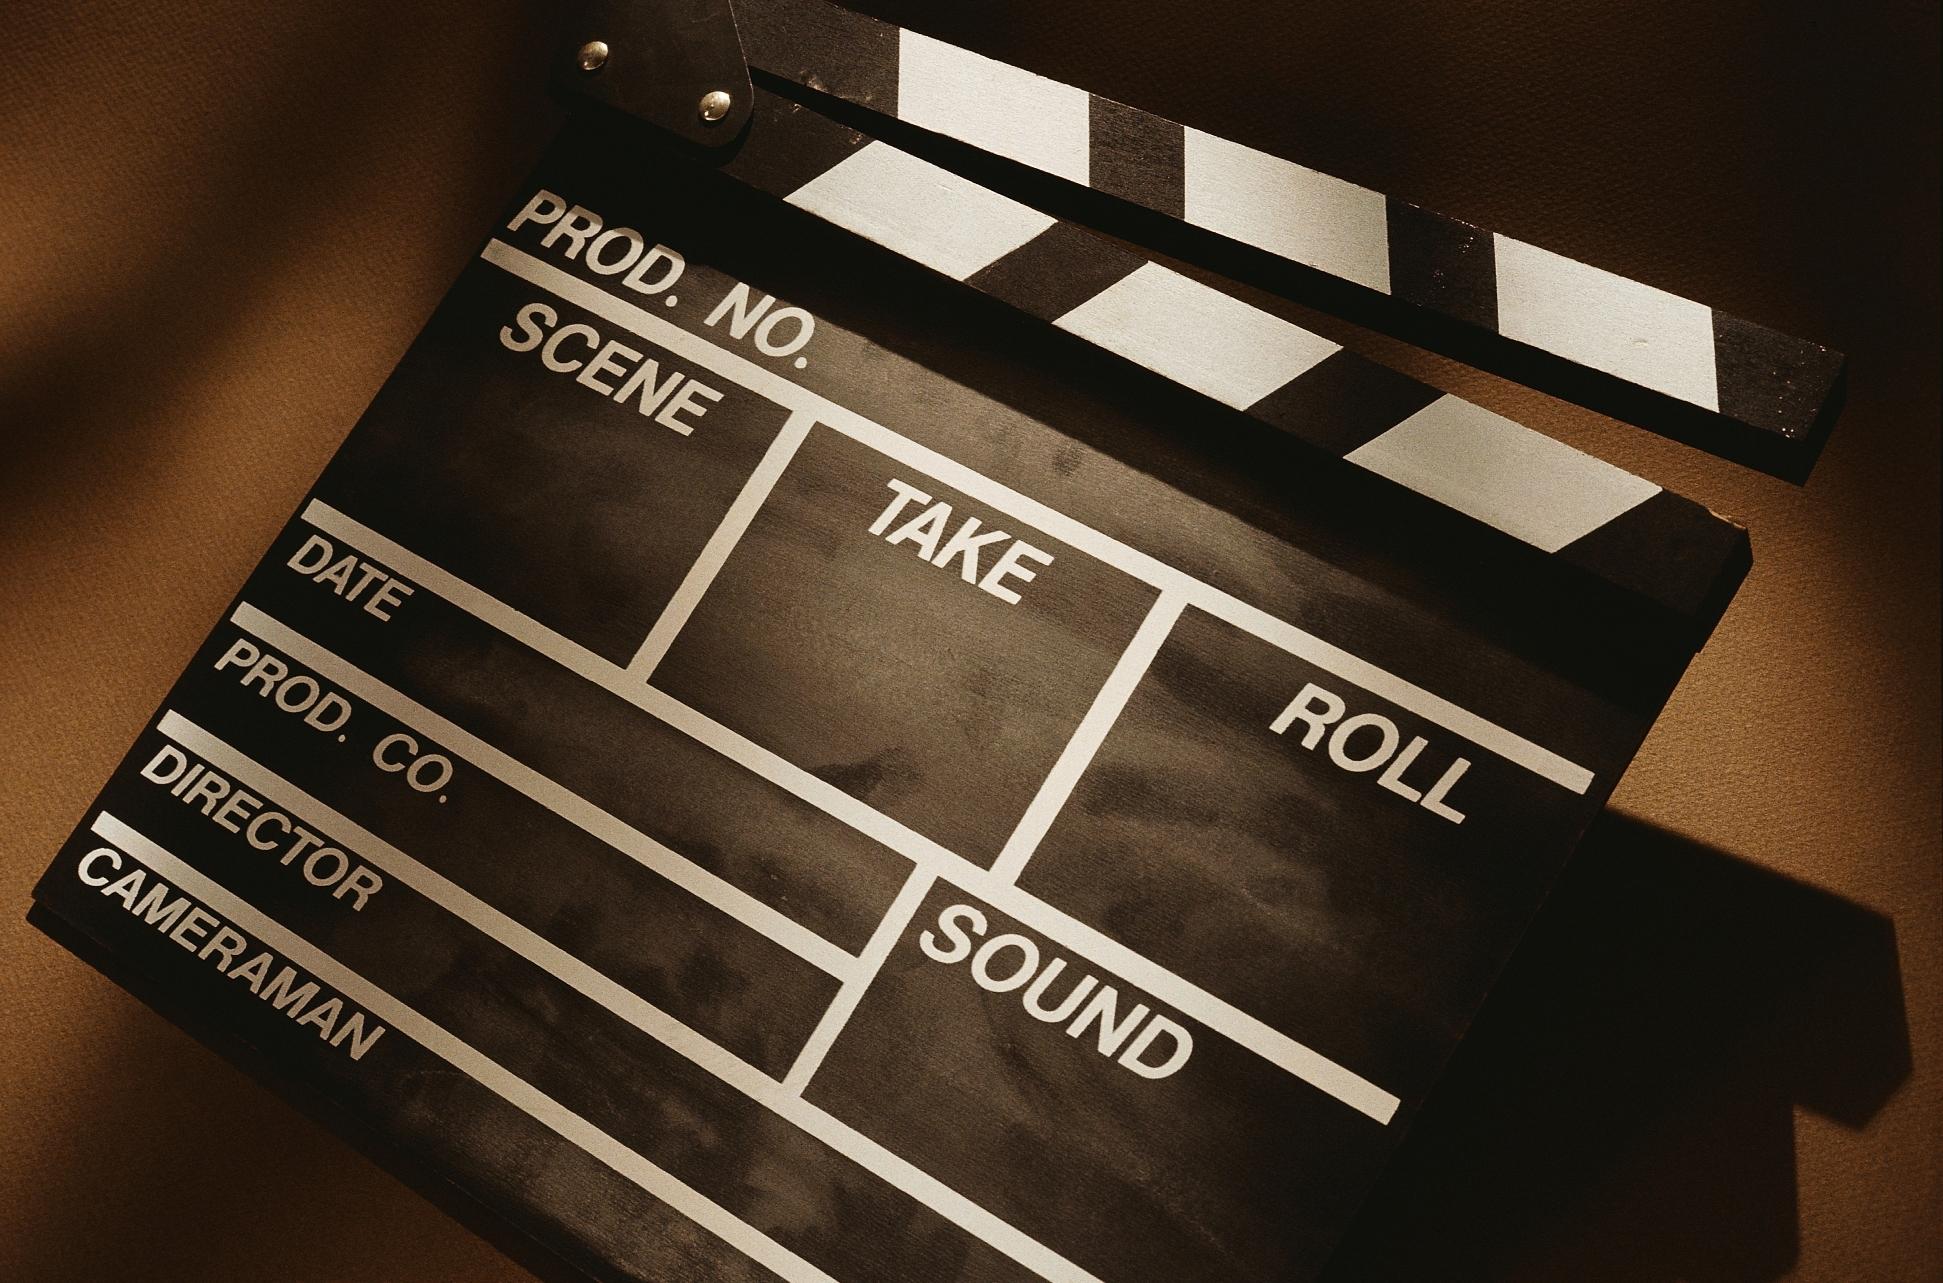 http://www.stealthsettings.com/wp-content/uploads/2007/05/WindowsLiveWriter/Film_CCF9/film%5B3%5D.jpg